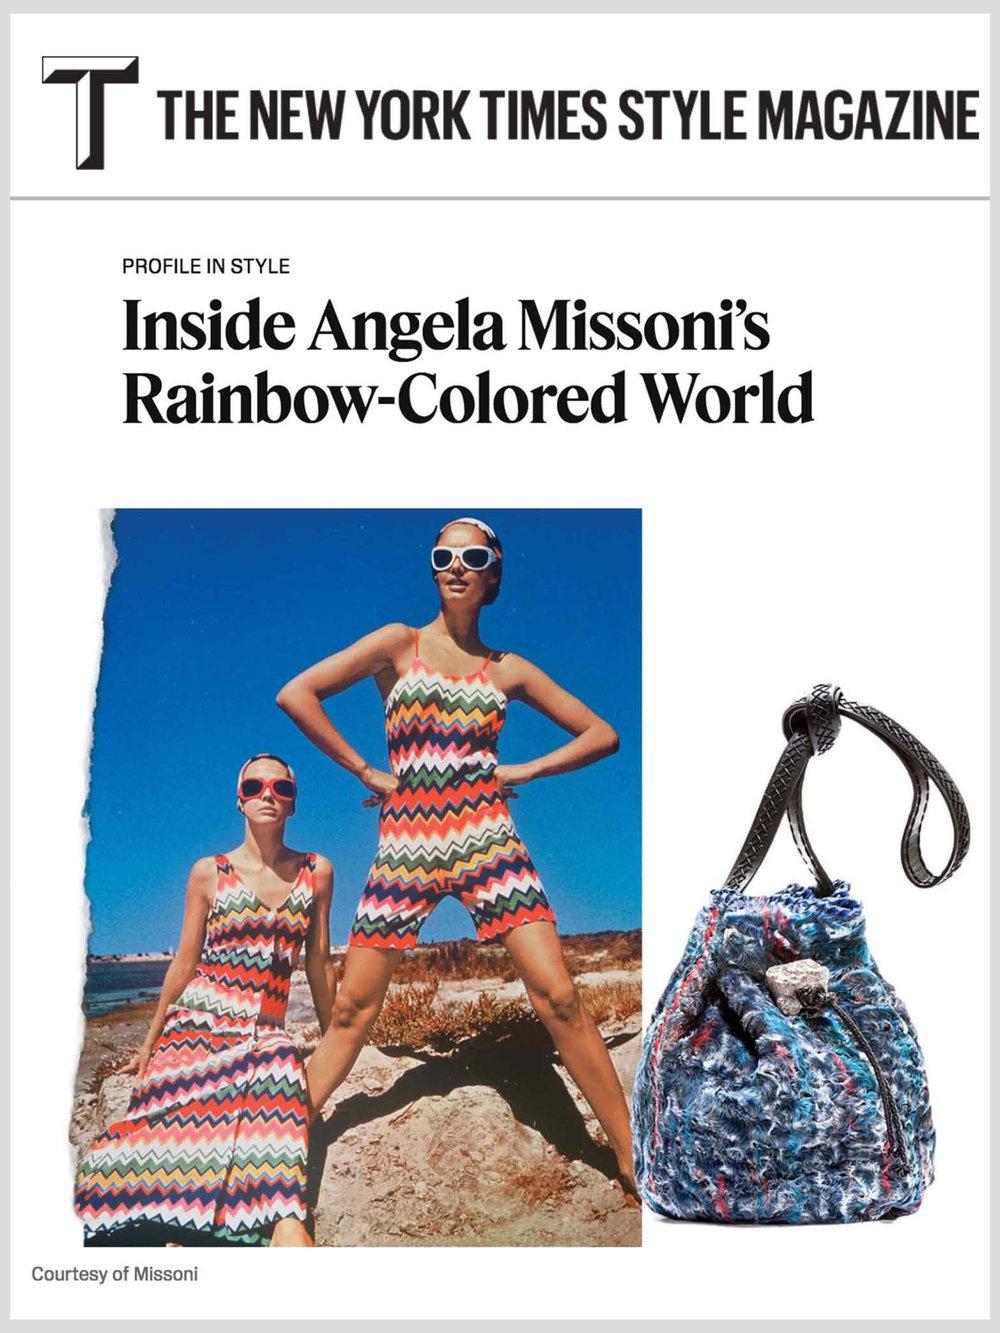 tmagazine_new_york_times_iacobella_missoni.jpg